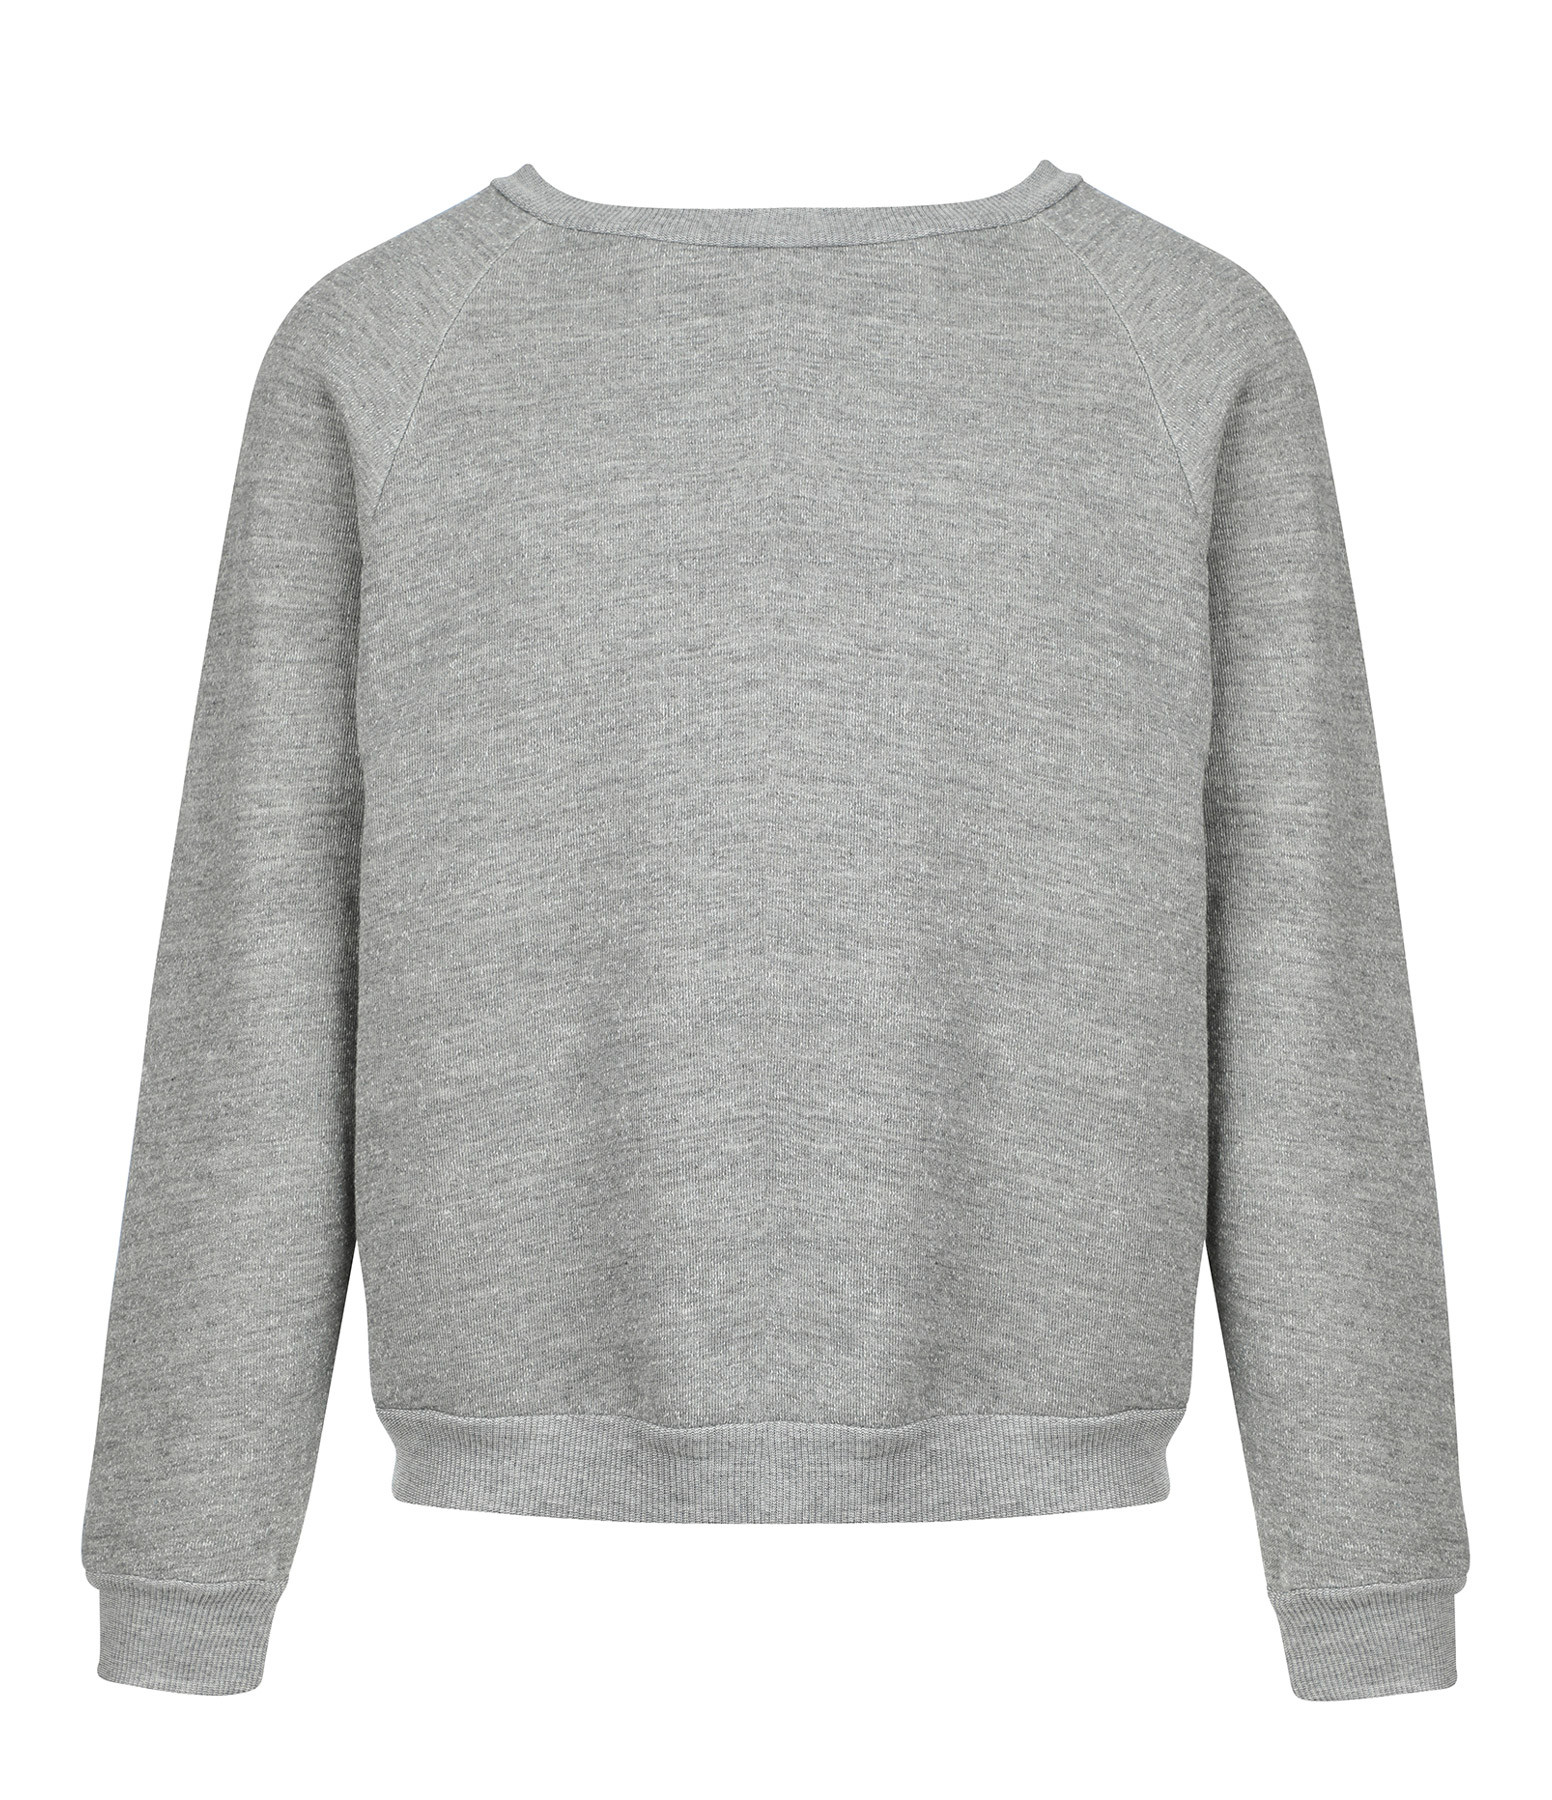 NILI LOTAN - Sweatshirt Classic Crew Gris Chiné